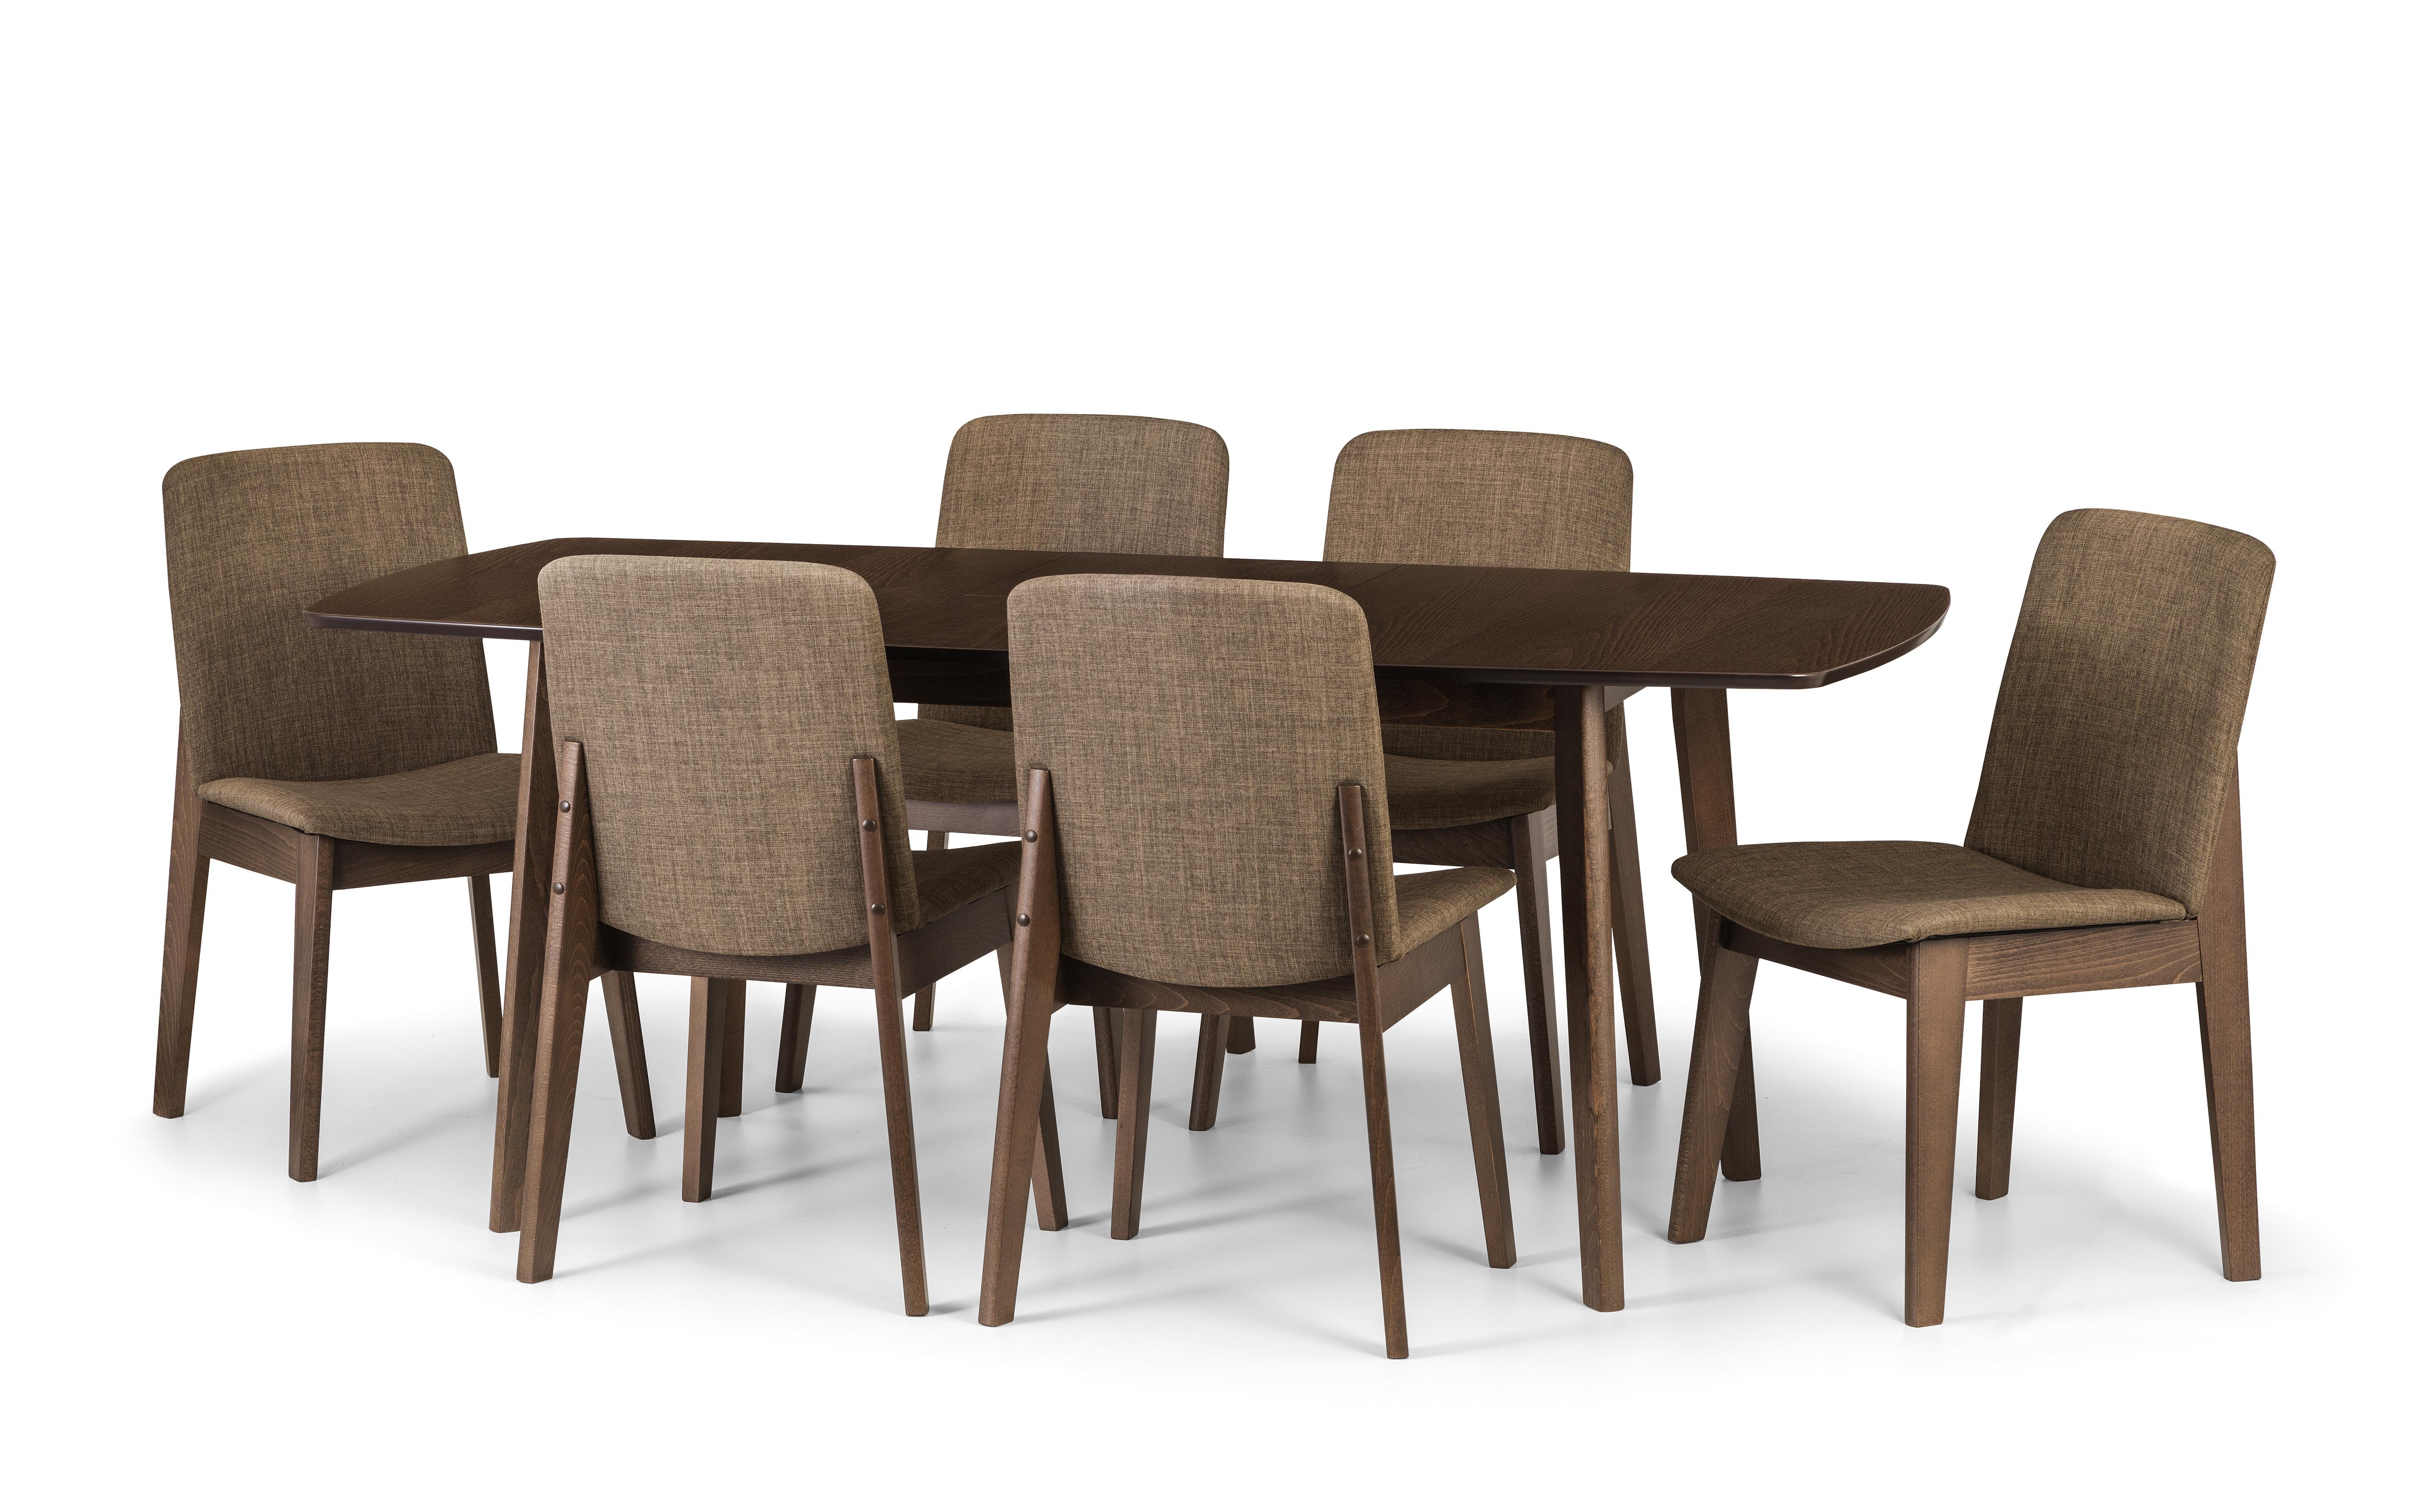 Julian bowen kensington extending dining table chairs walnut finish